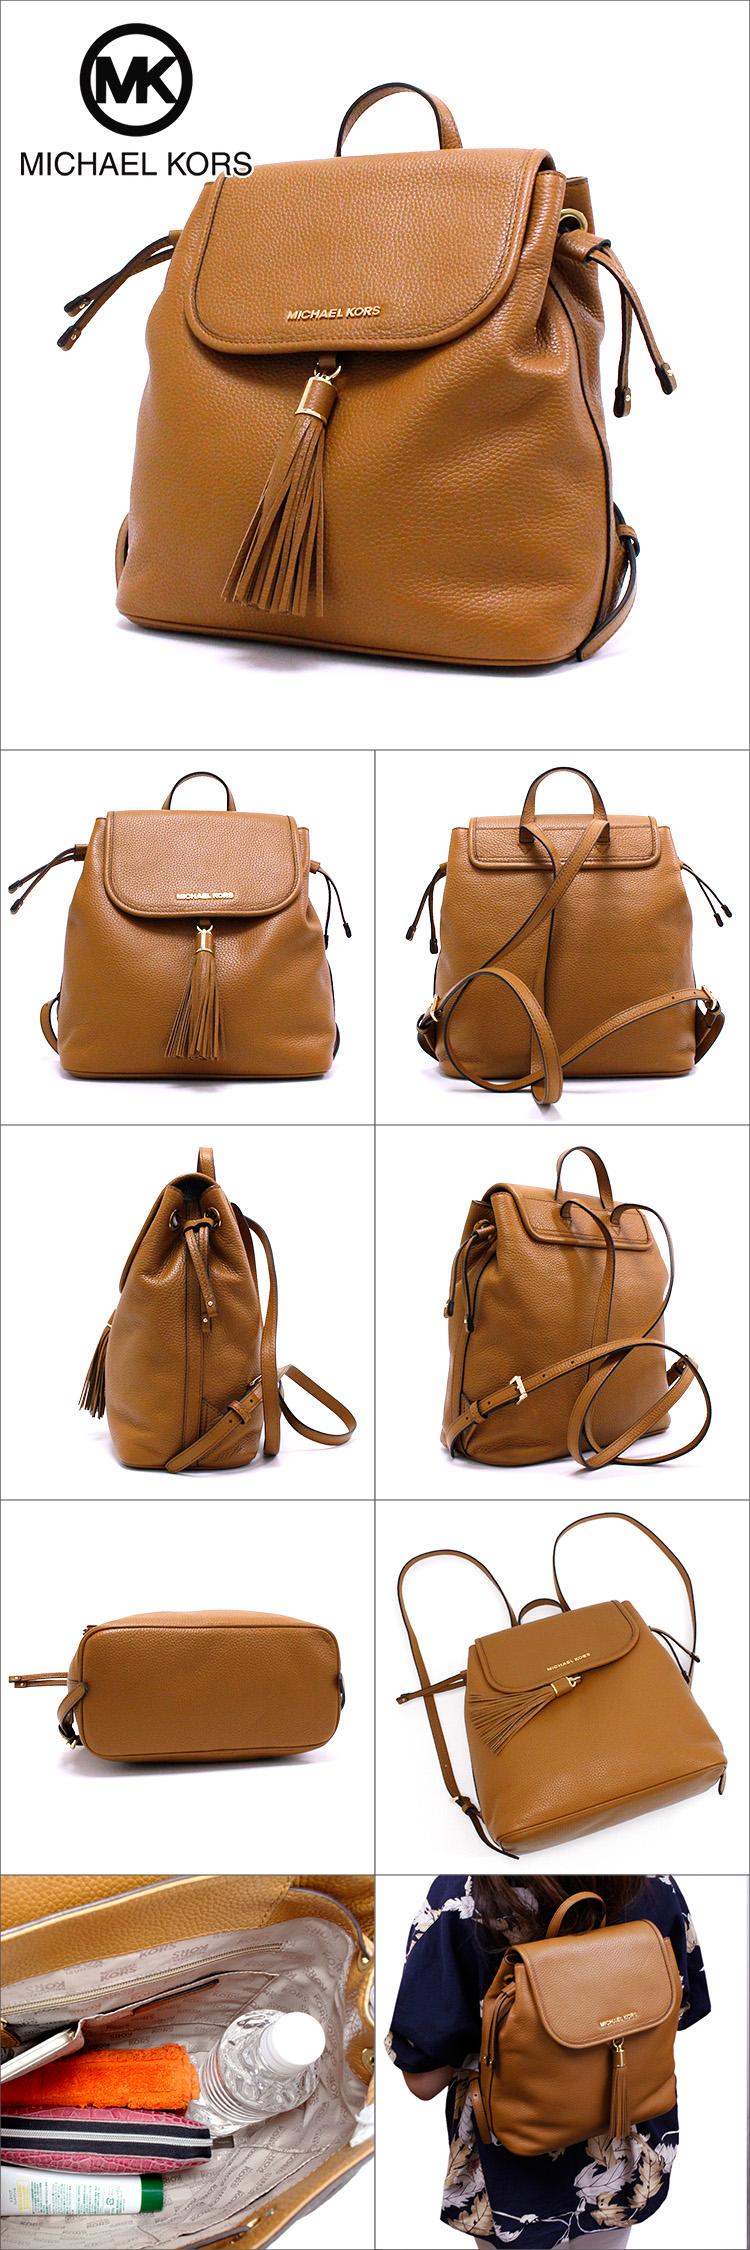 mkcollection rakuten global market michael kors rucksack lady u0027s